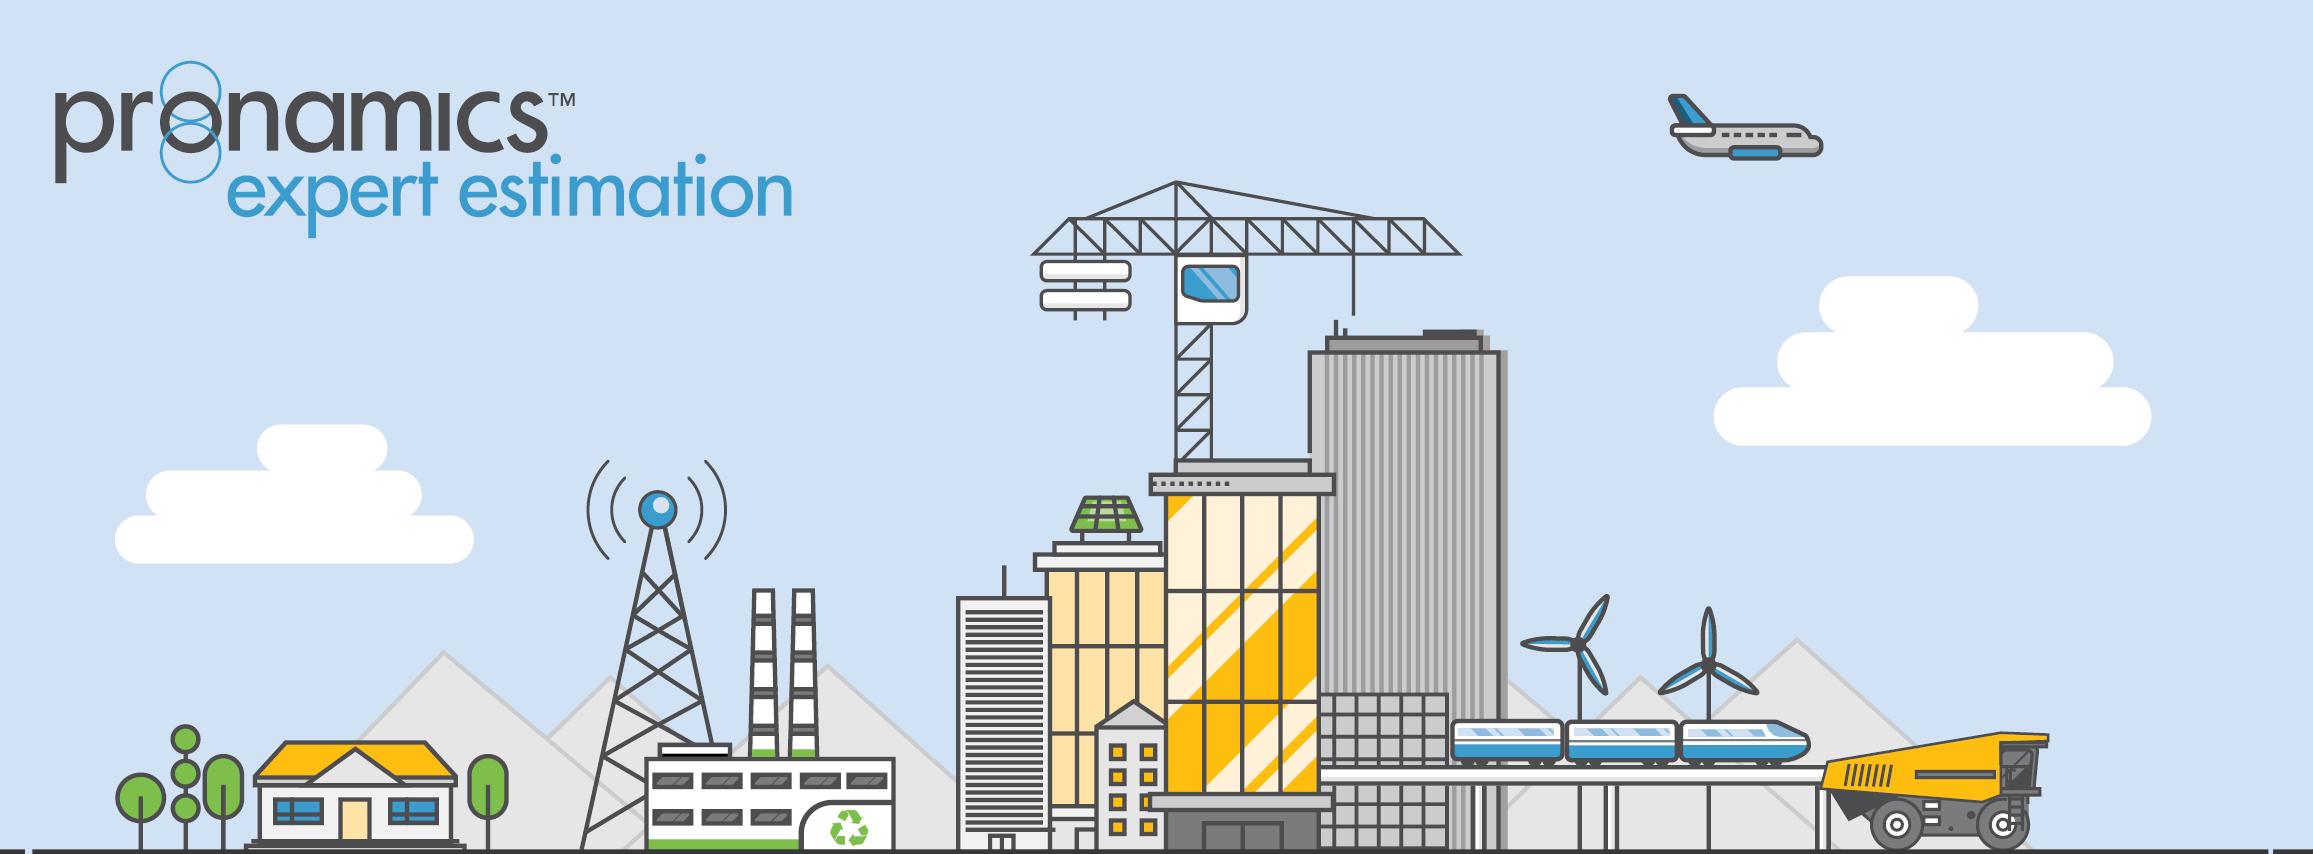 Pronamics Expert Estimation Cityscape